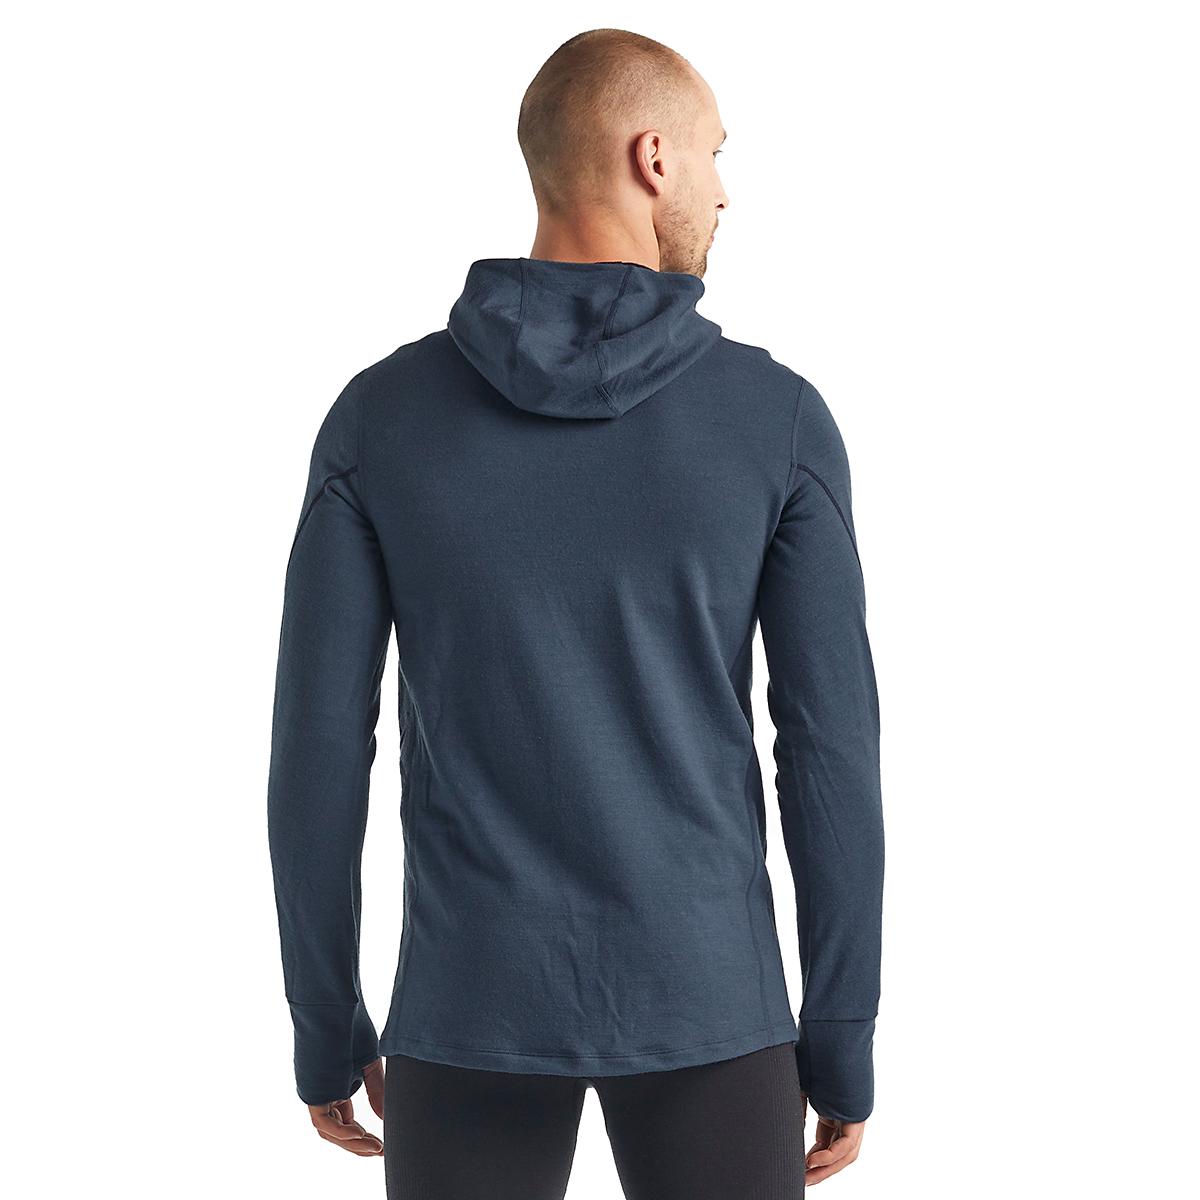 Men's Icebreaker Merino Quantum II Long Sleeve Zip Hood Jacket - Color: Serene Blue - Size: S, Serene Blue, large, image 2